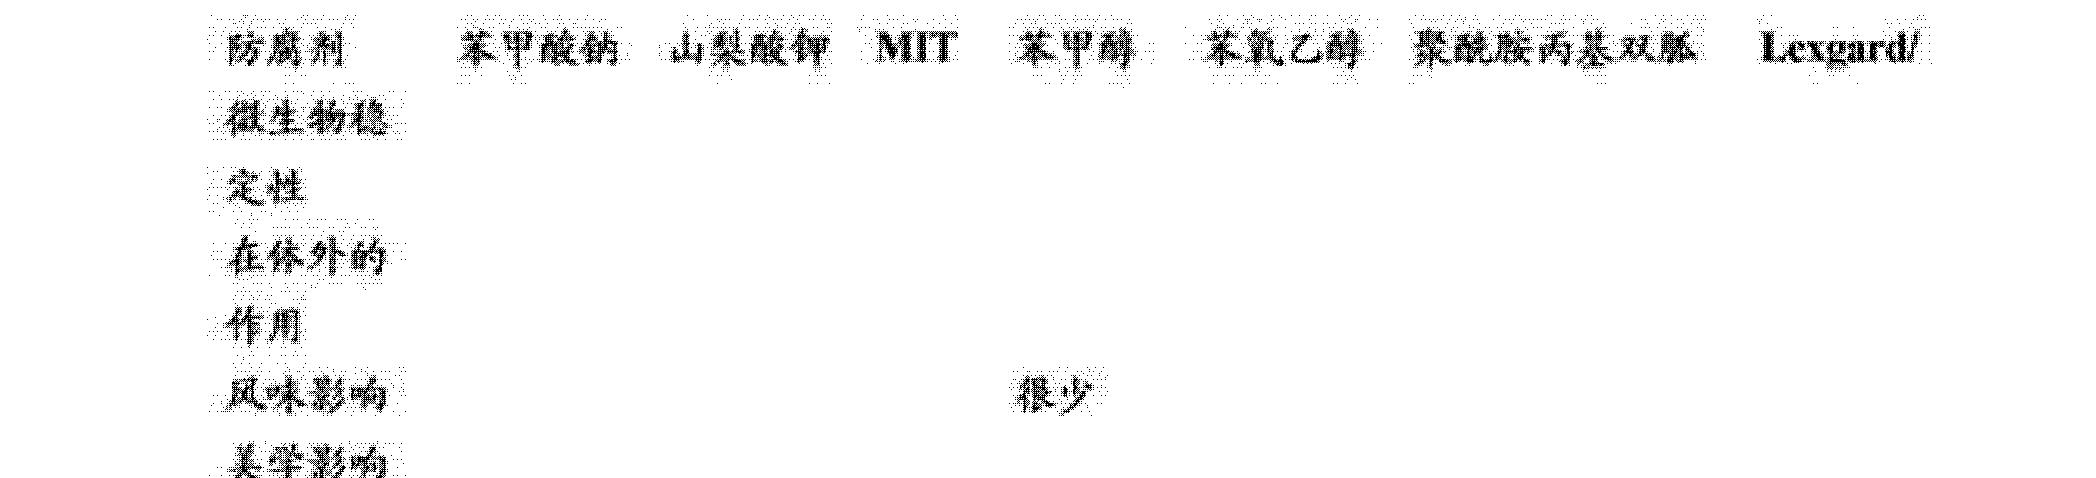 Figure CN103189040AD00131